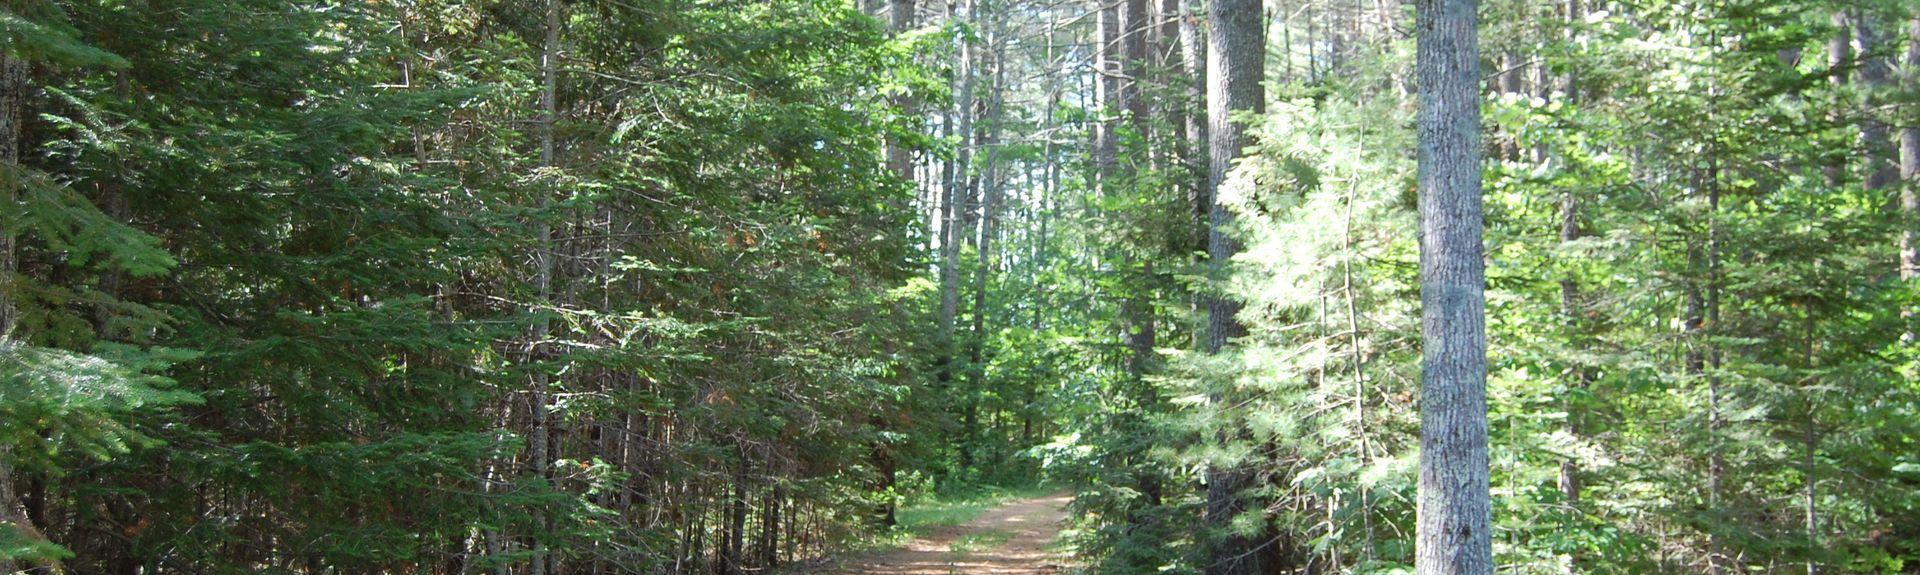 Brooks, Maine, Stati Uniti d'America